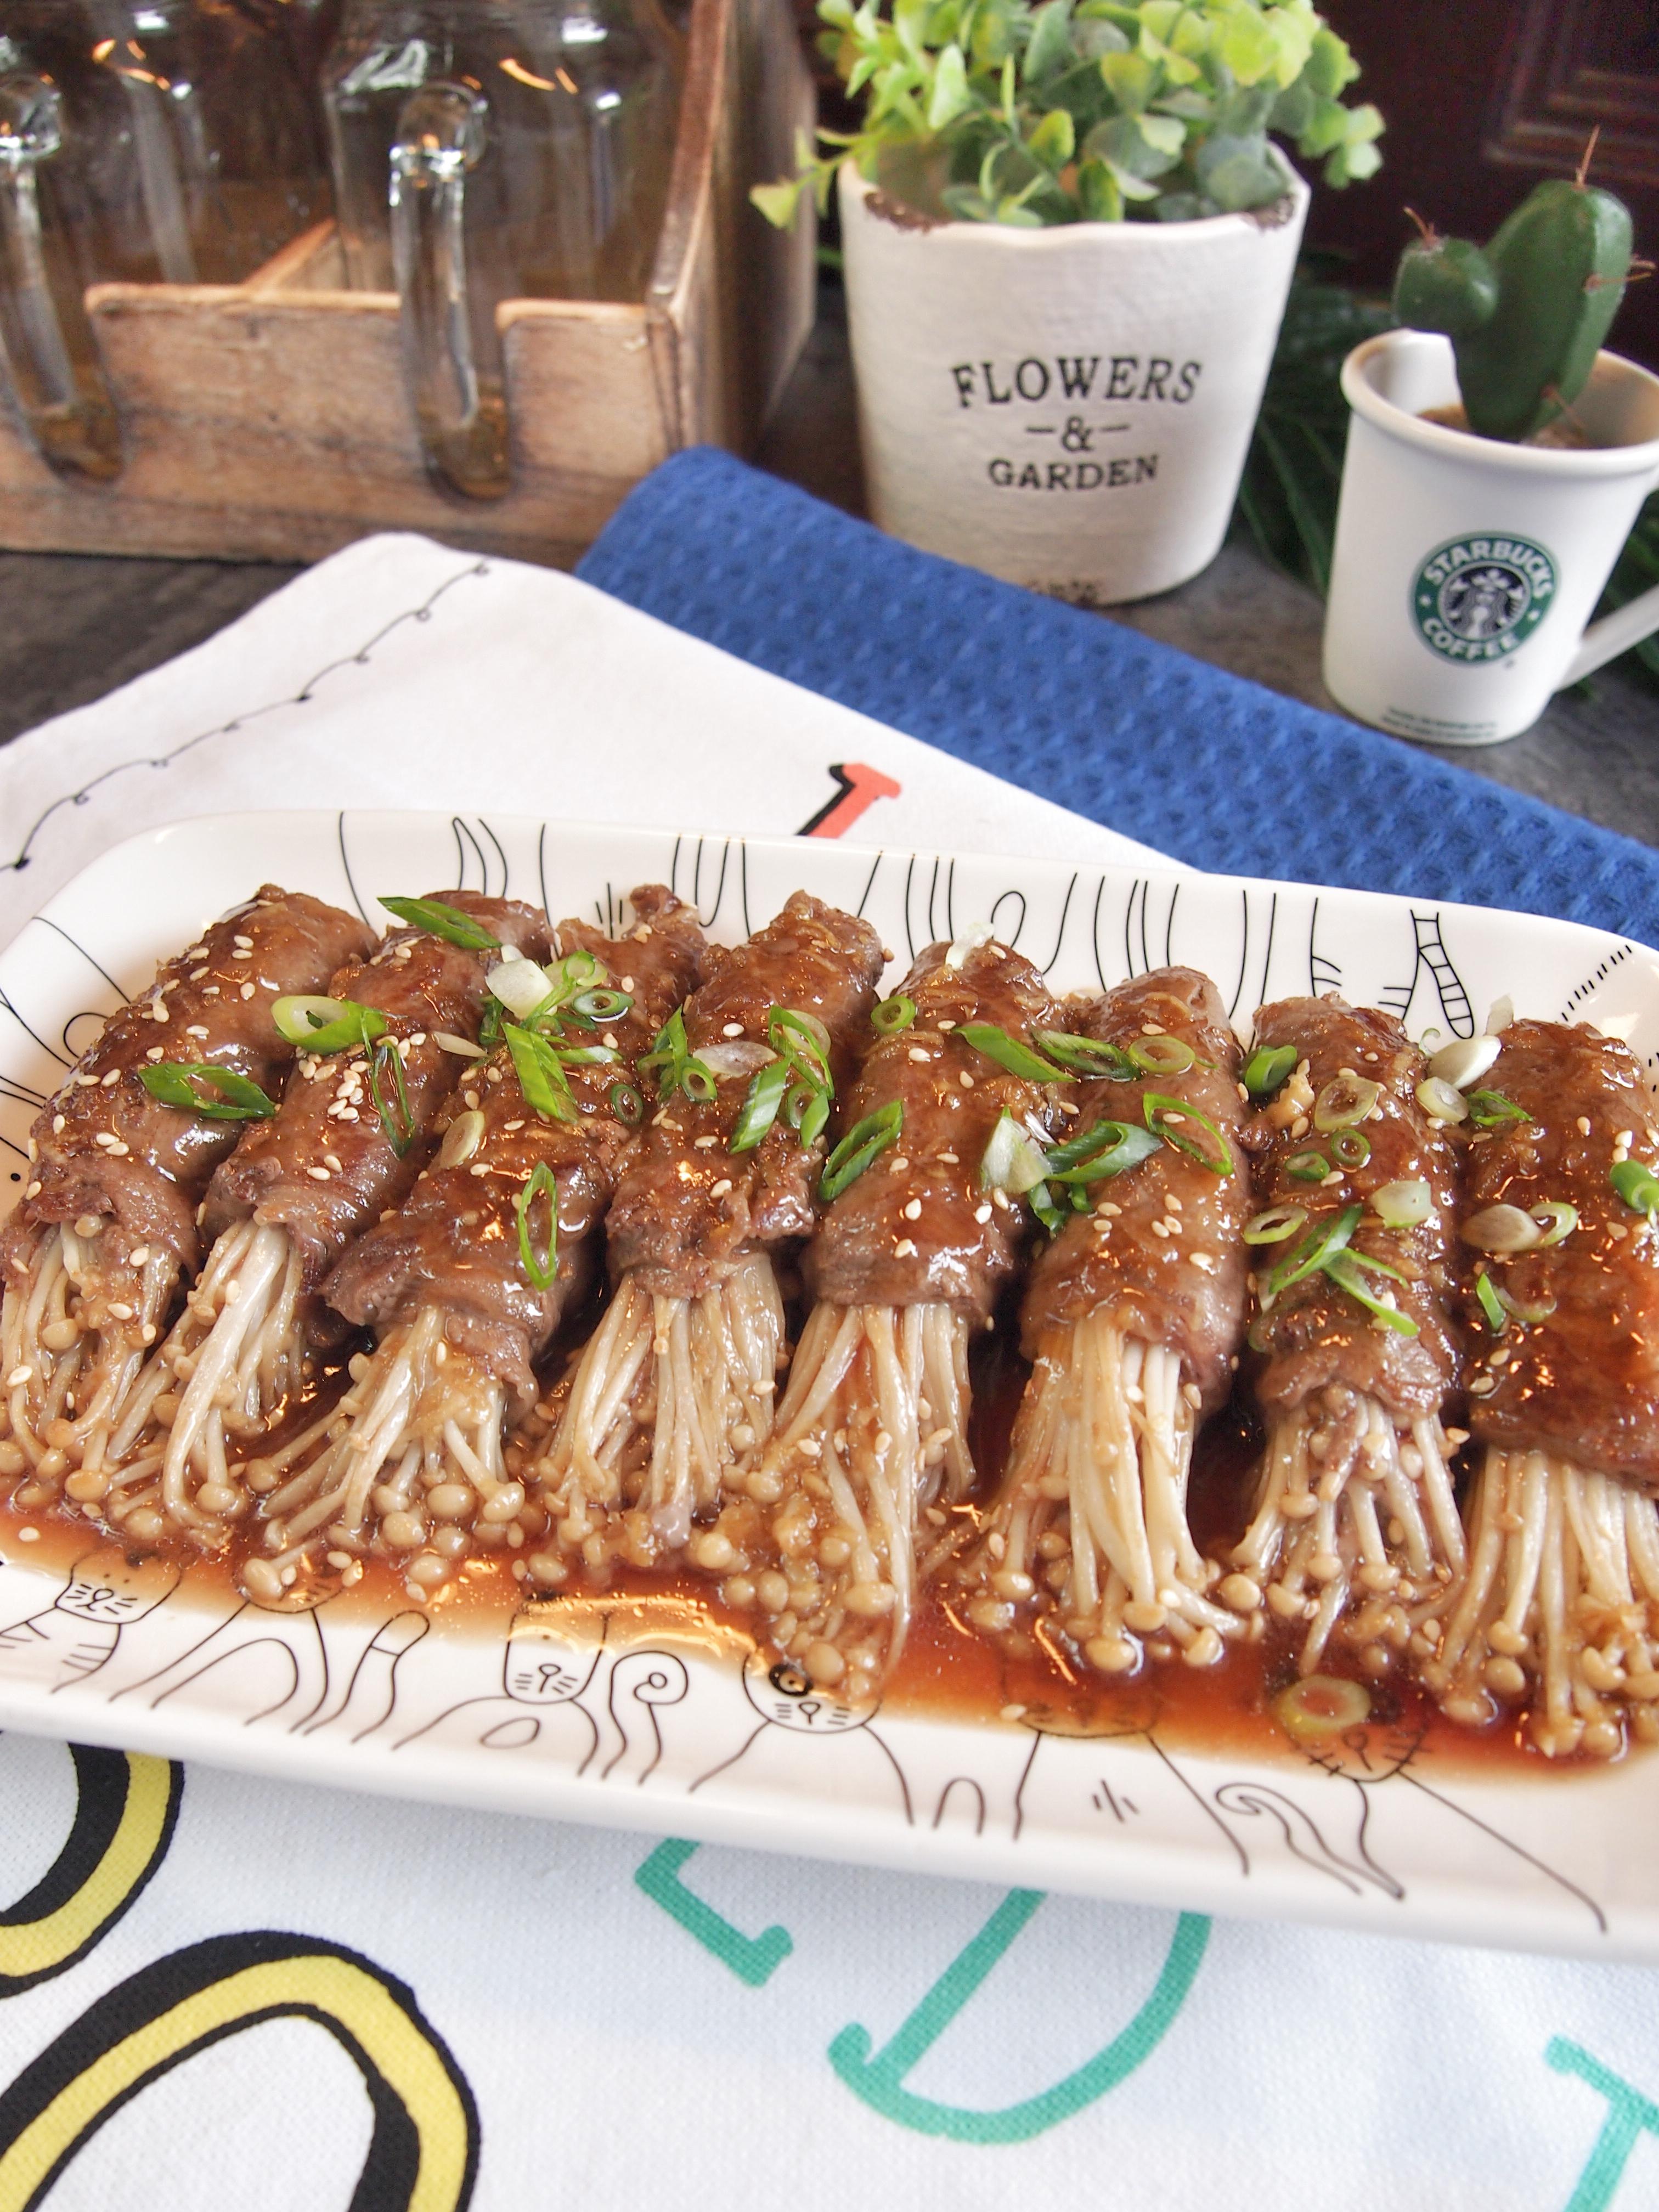 SUPER EASY Japanese Enoki (Mushroom) Beef Rolls in Teriyaki Sauce Recipe 金菇肥牛卷